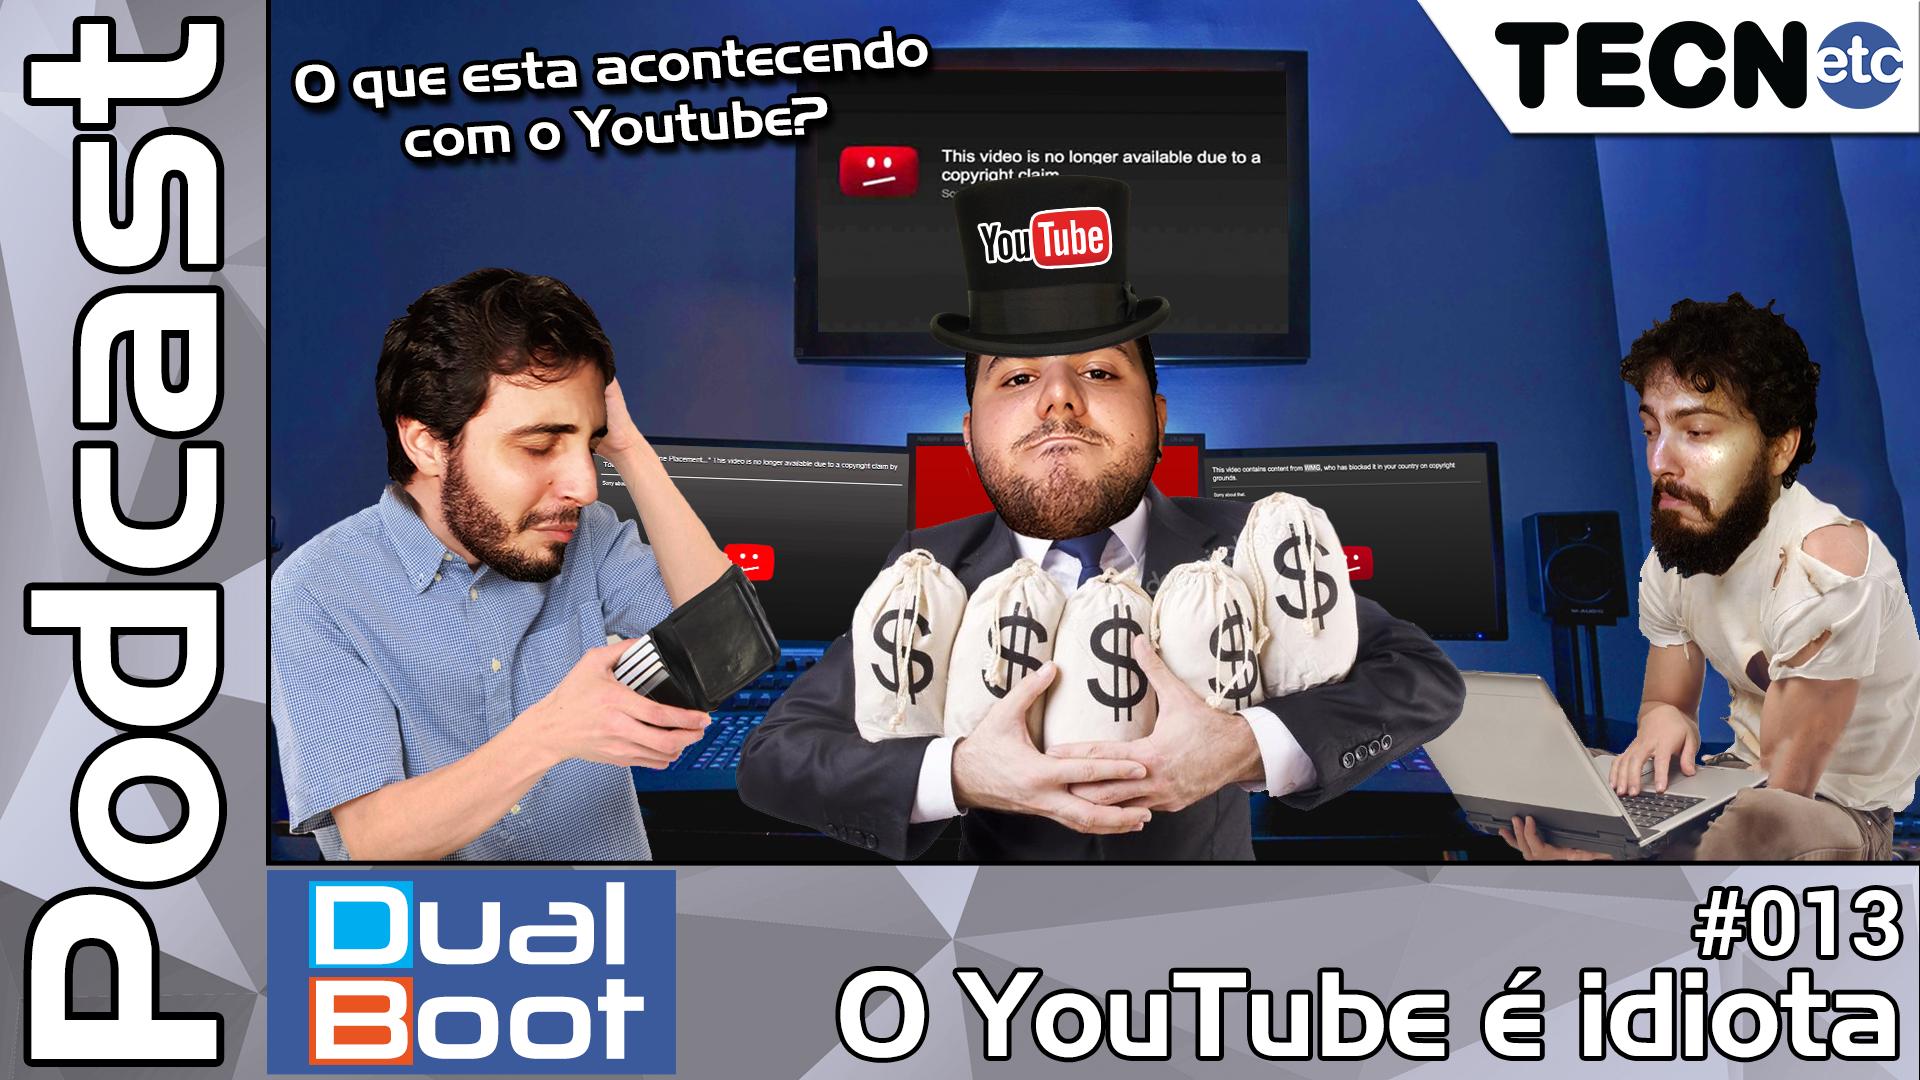 Dual Boot #013: O YouTube é idiota – Podcast